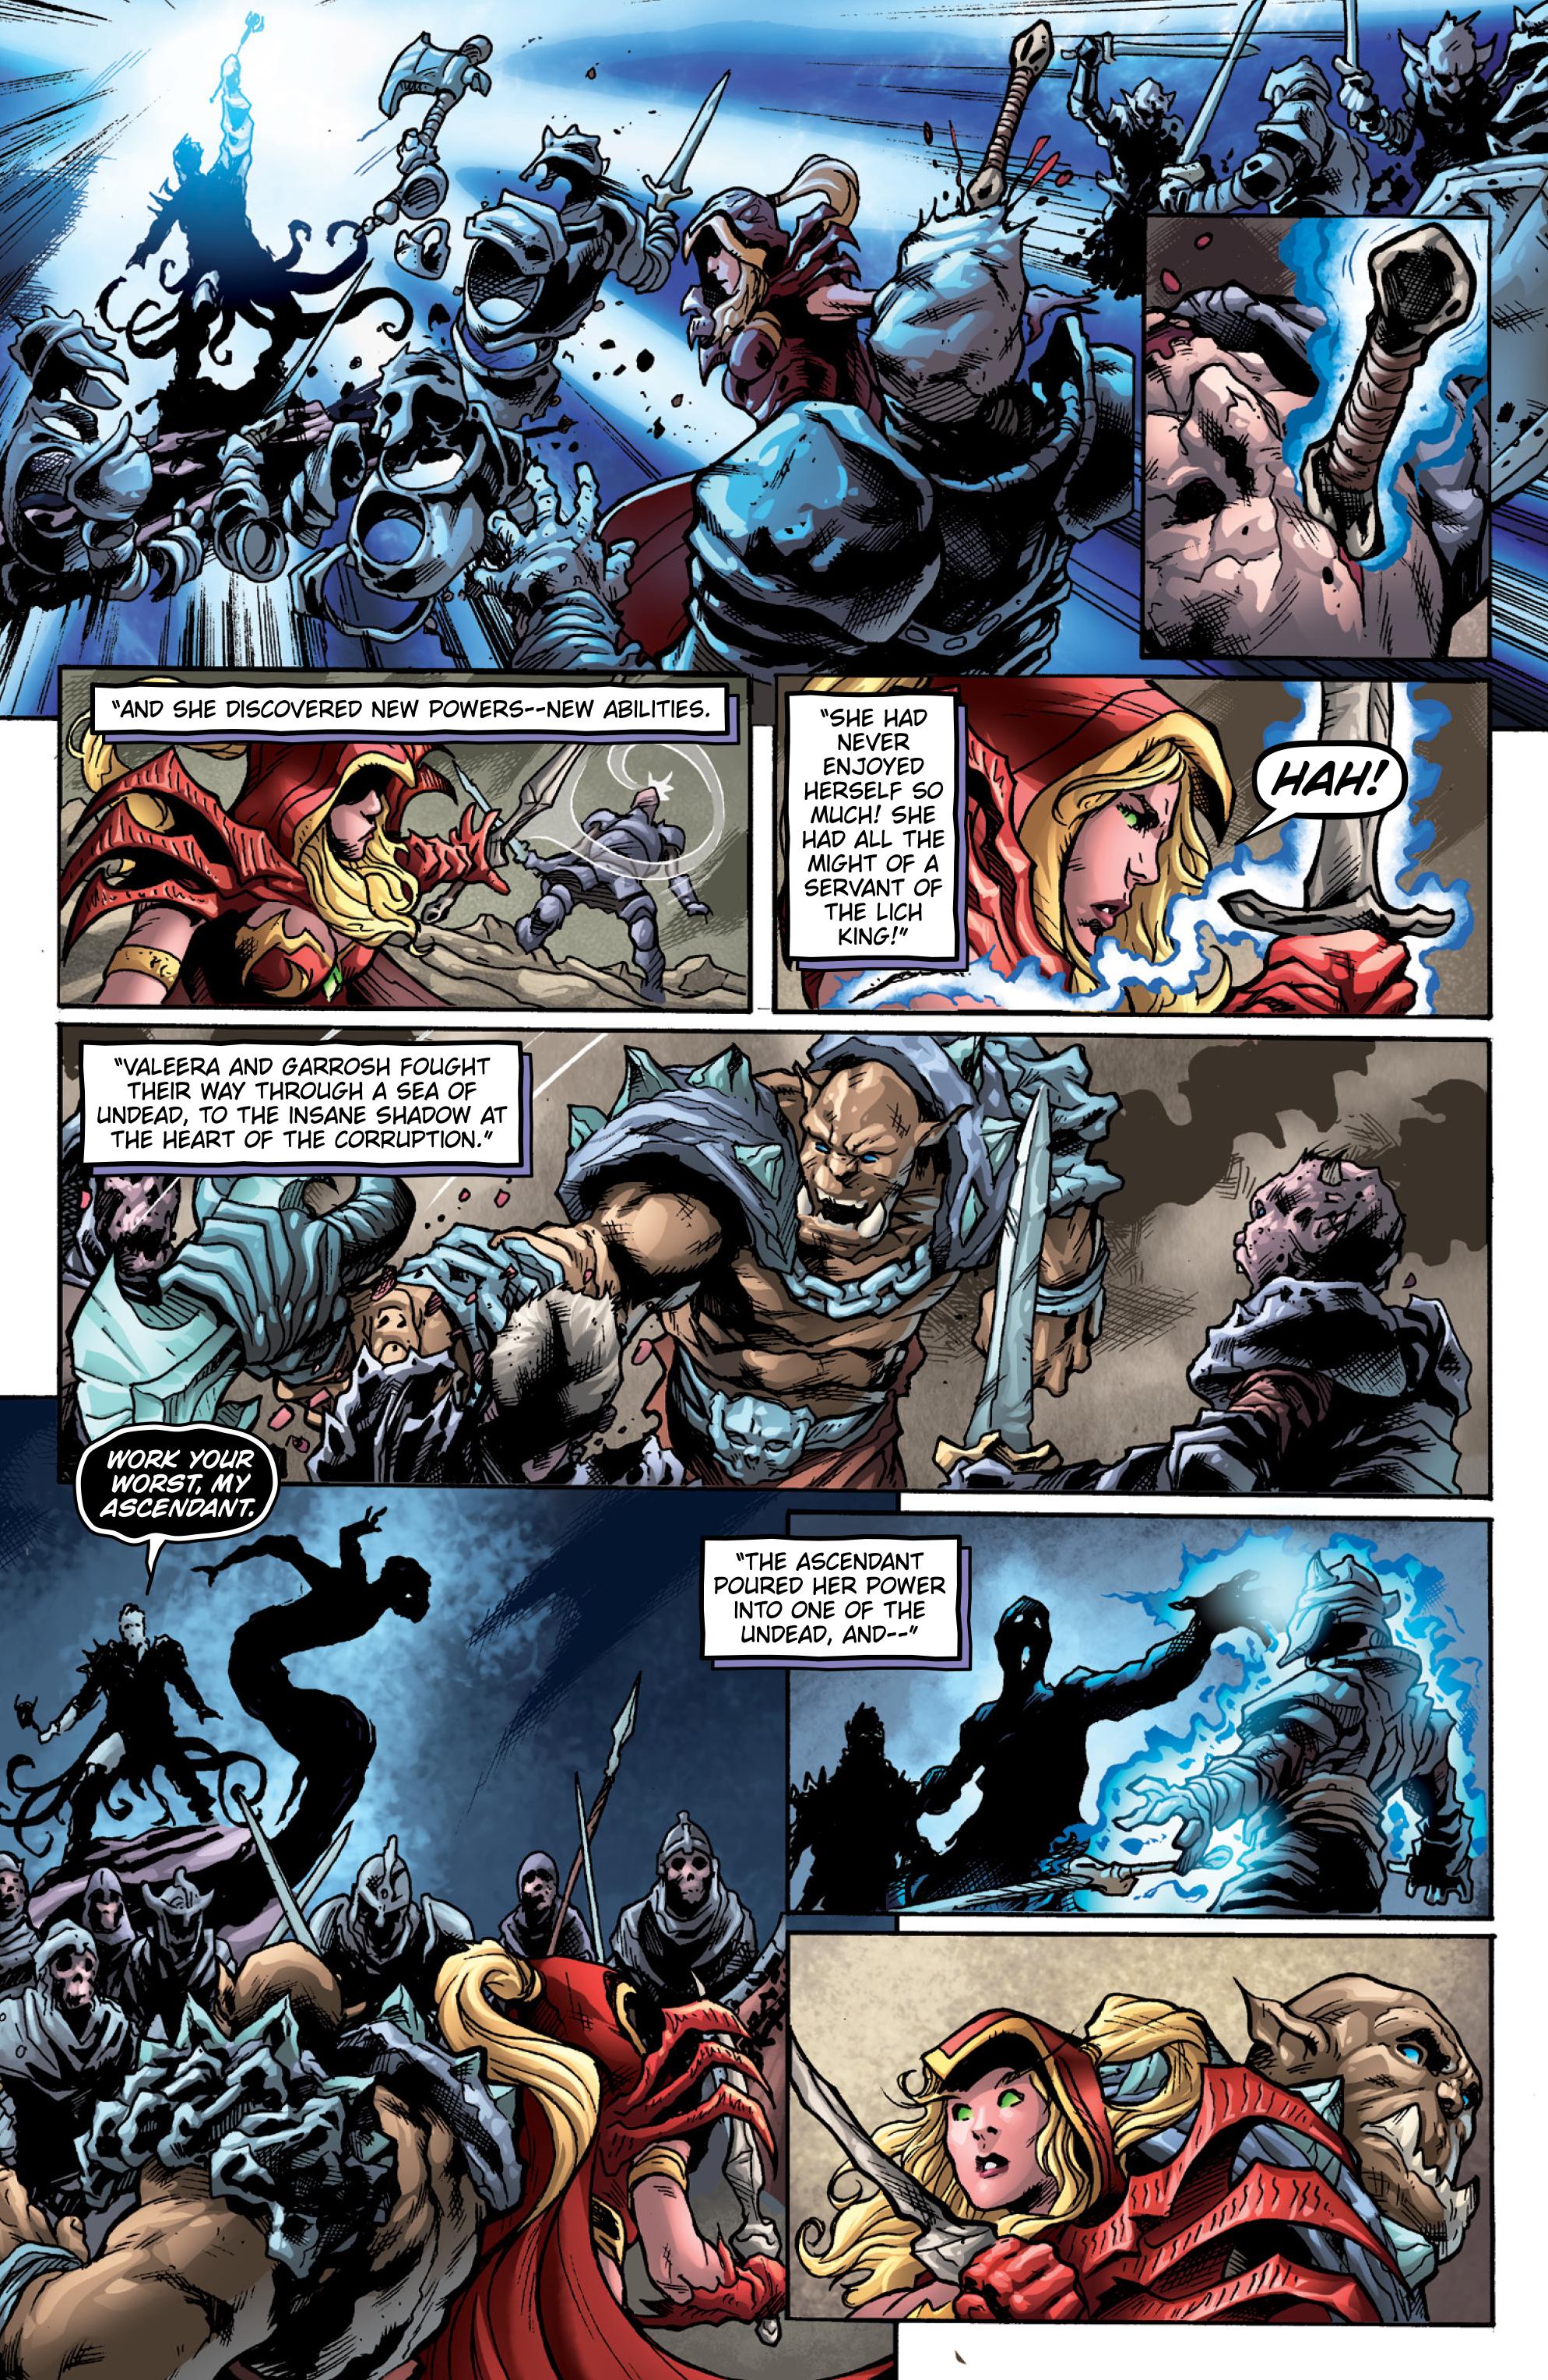 Hearthstone's Third Comic Released - Freedom - News - HearthPwn